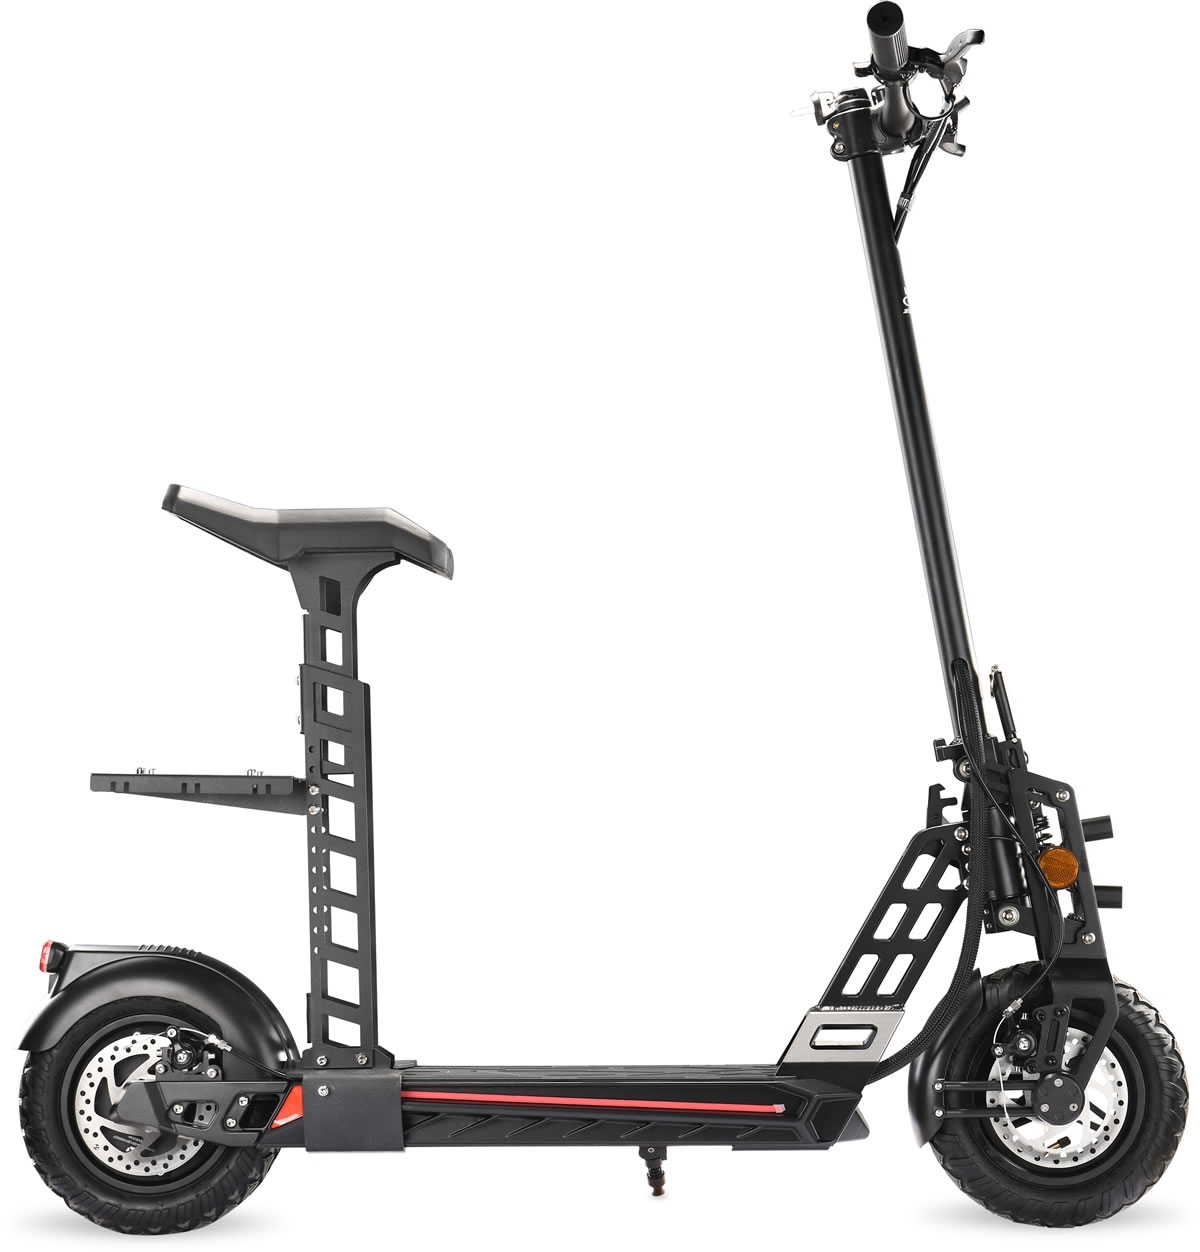 Highest spec scooter